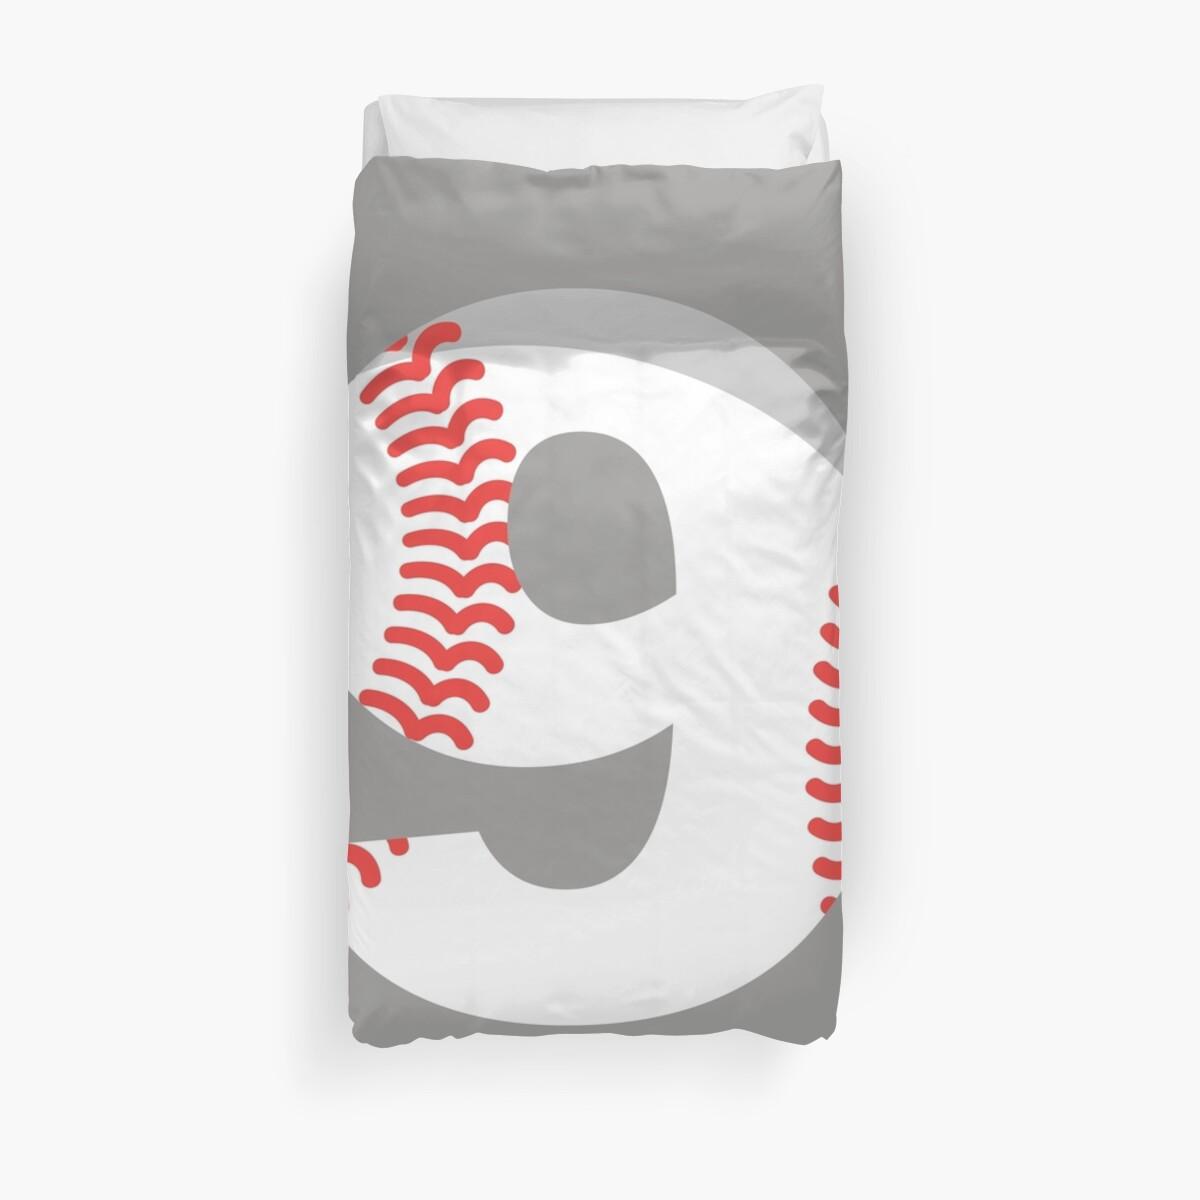 Number 9 Baseball #9 by melsens